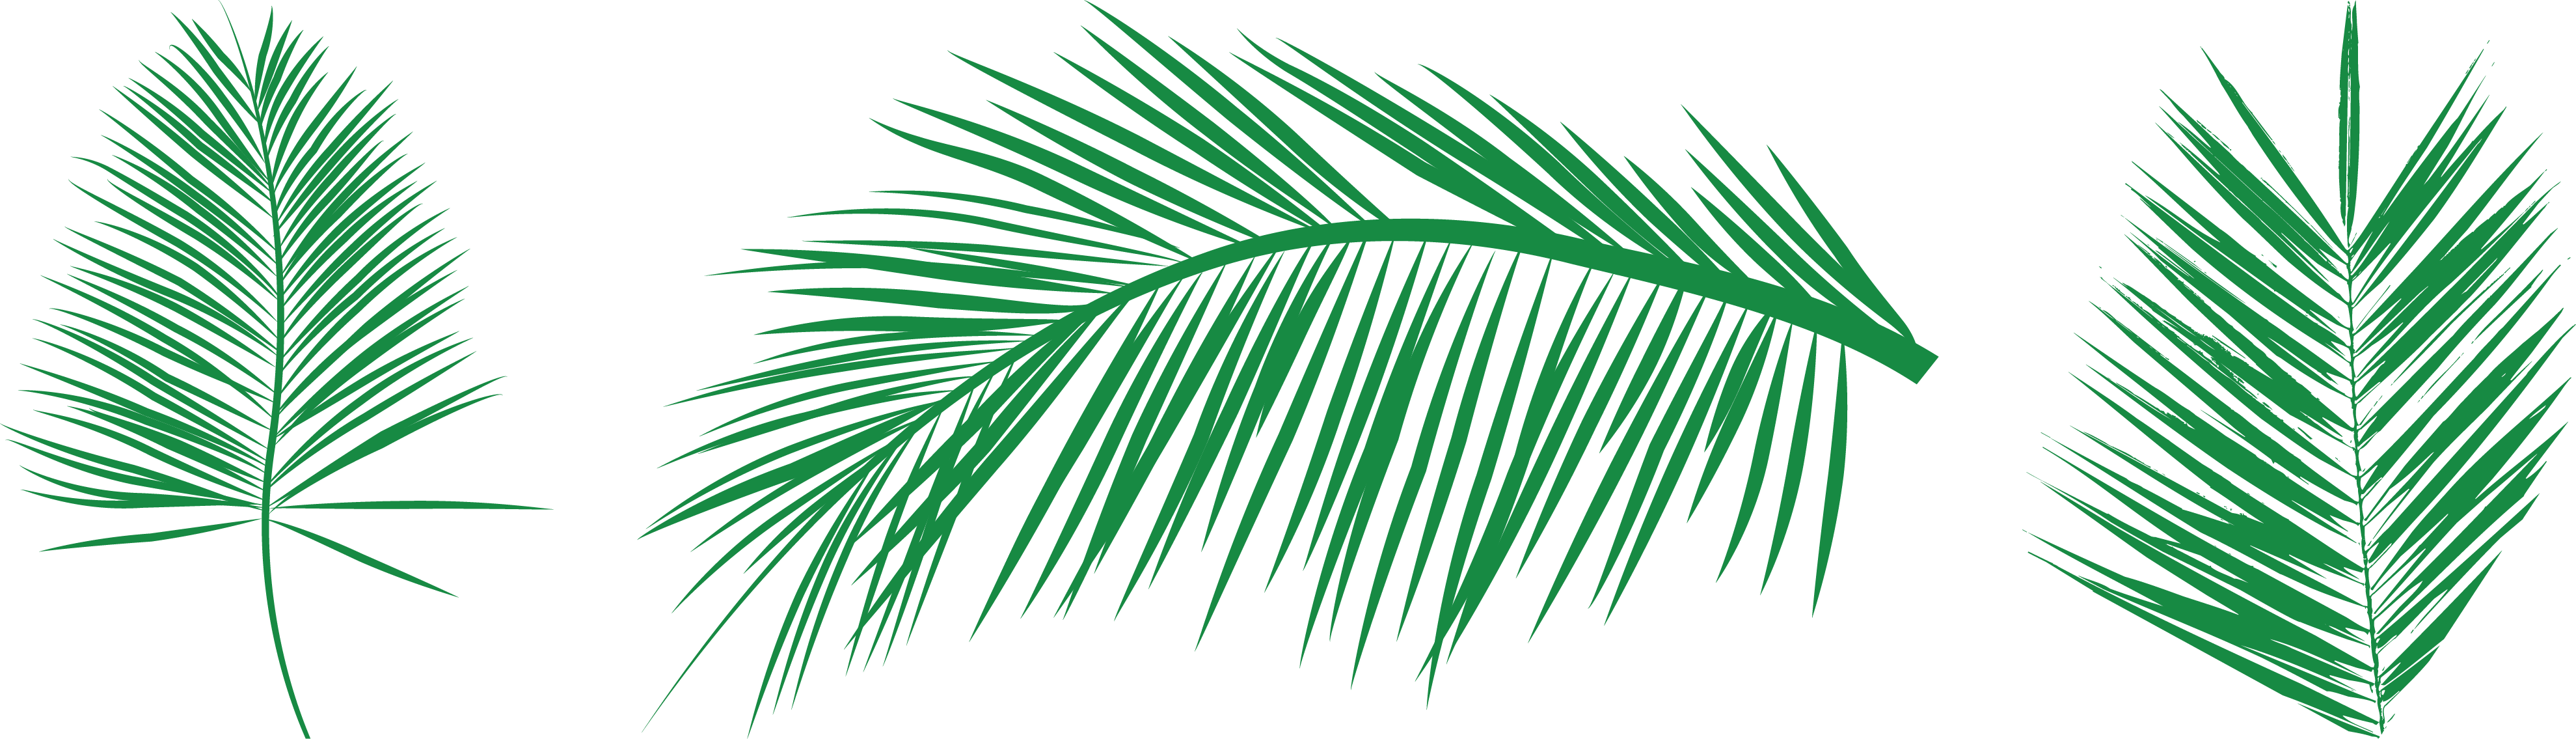 Needle clipart pine tree. Leaf palm branch arecaceae